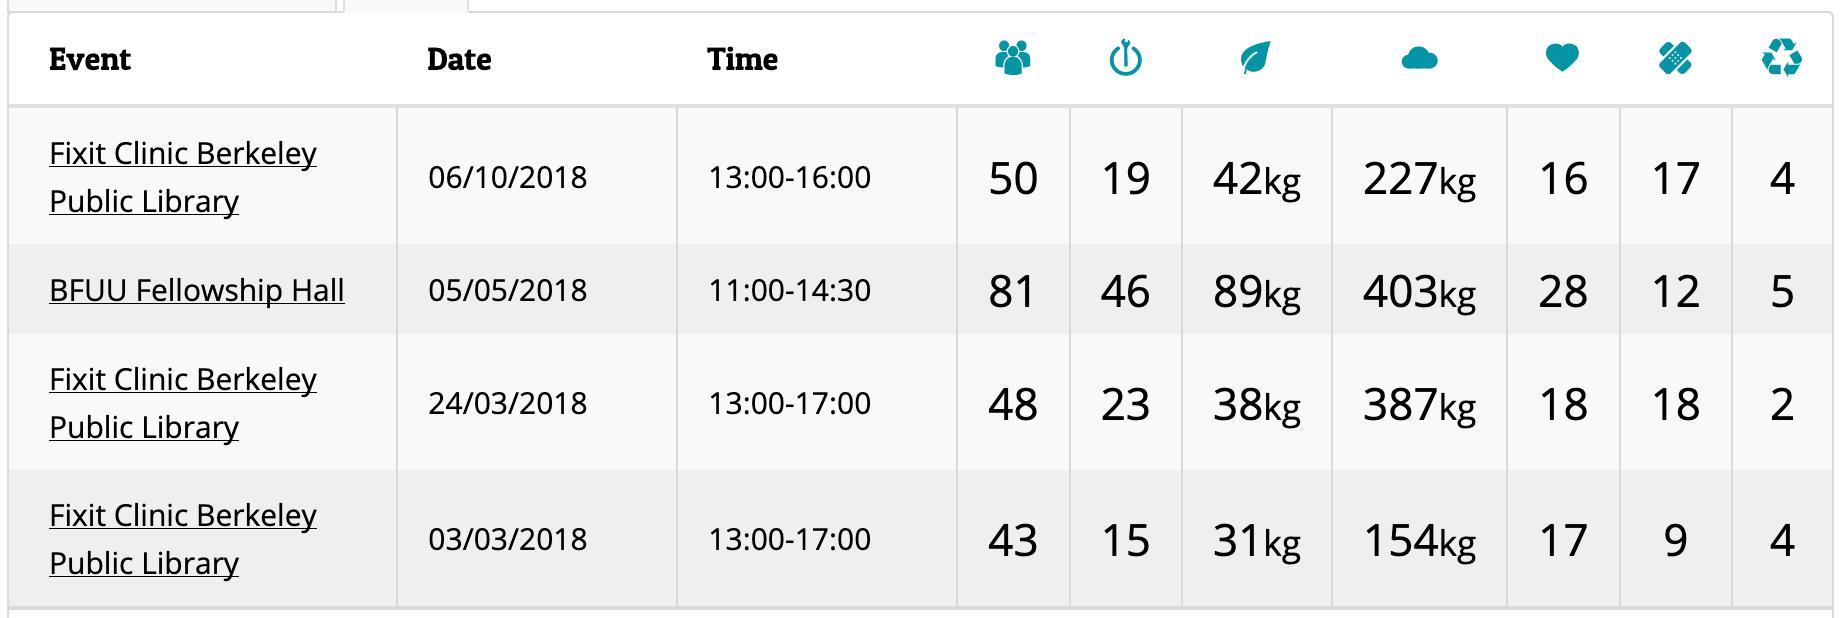 Fixometer 4 events breakout.png